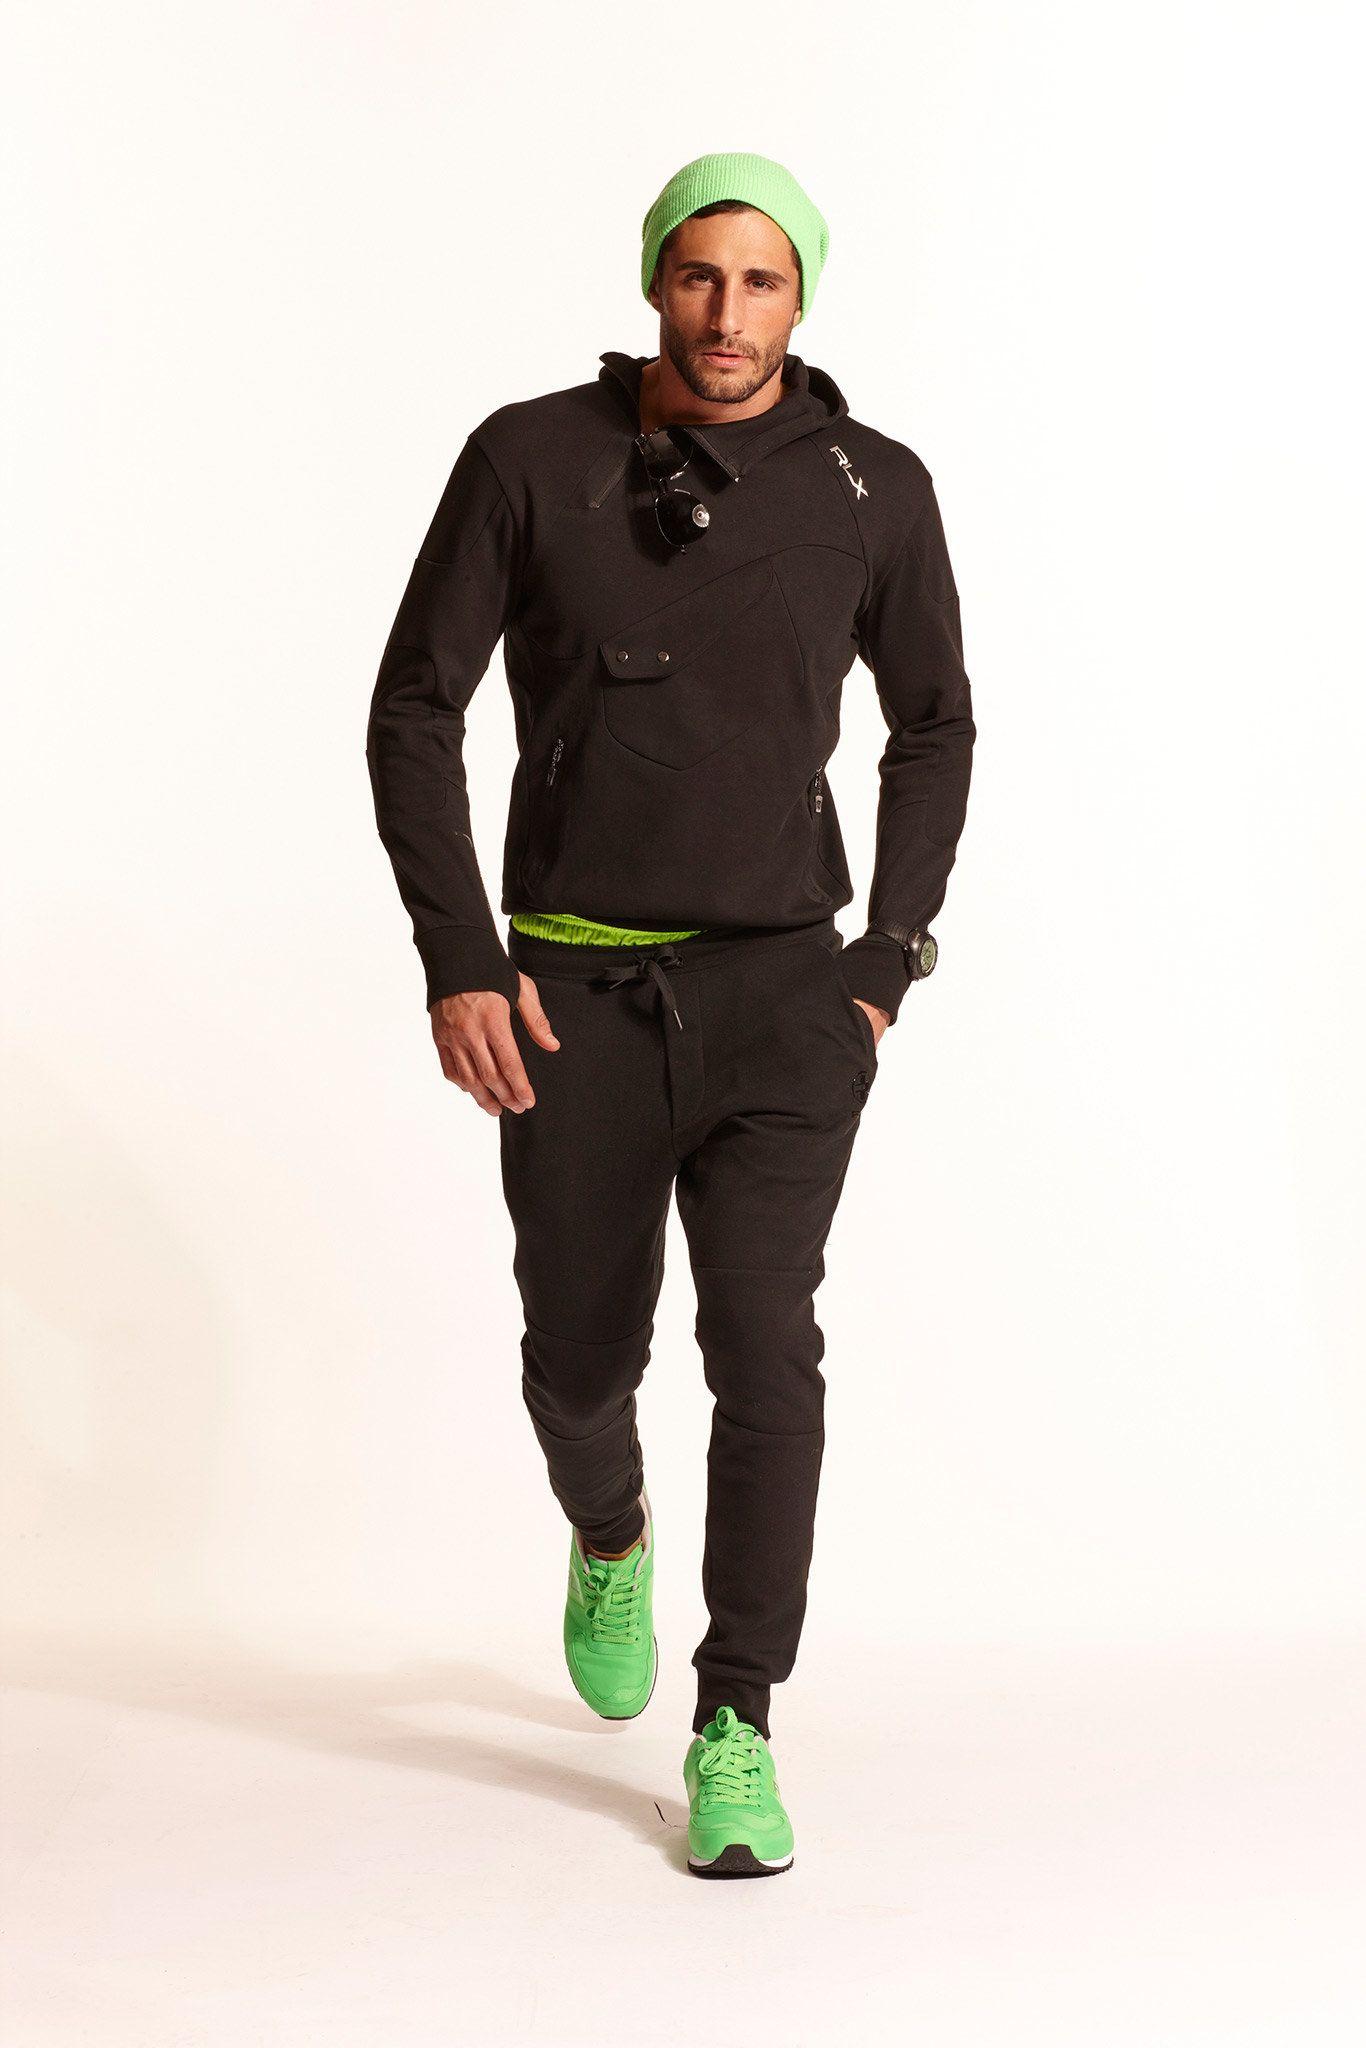 Ralph Lauren Fall 2015 Menswear Fashion Show - Polo Sport